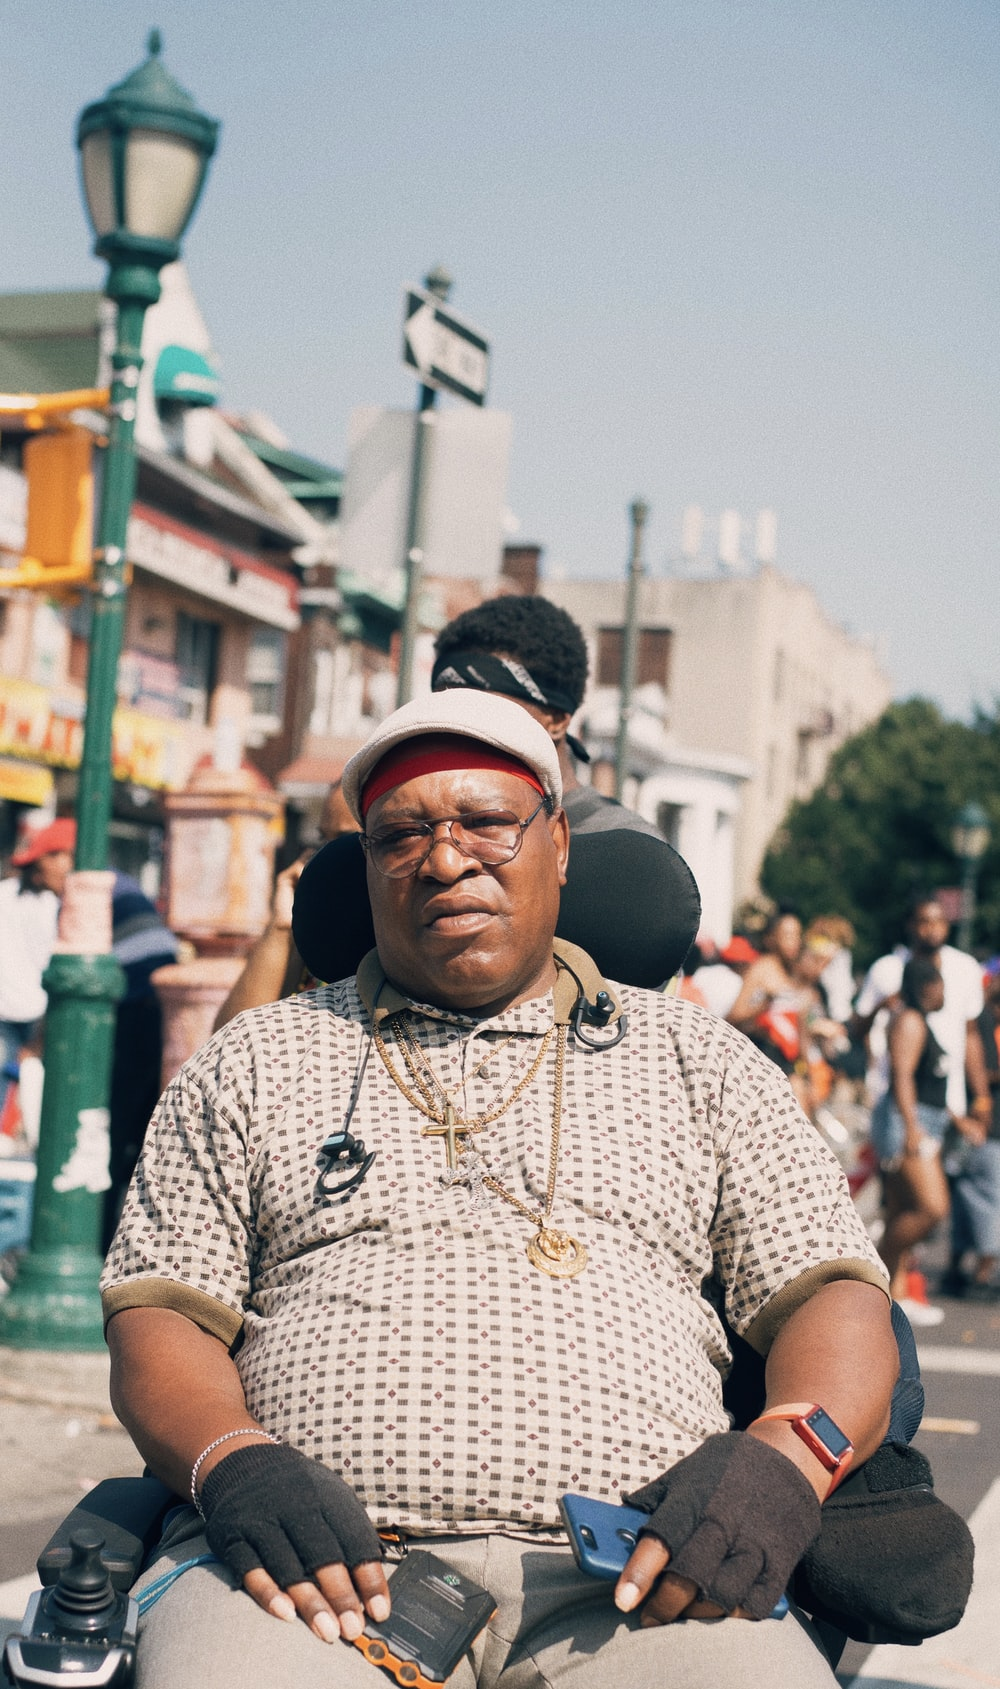 man sitting on motorized wheelchair on street at daytime